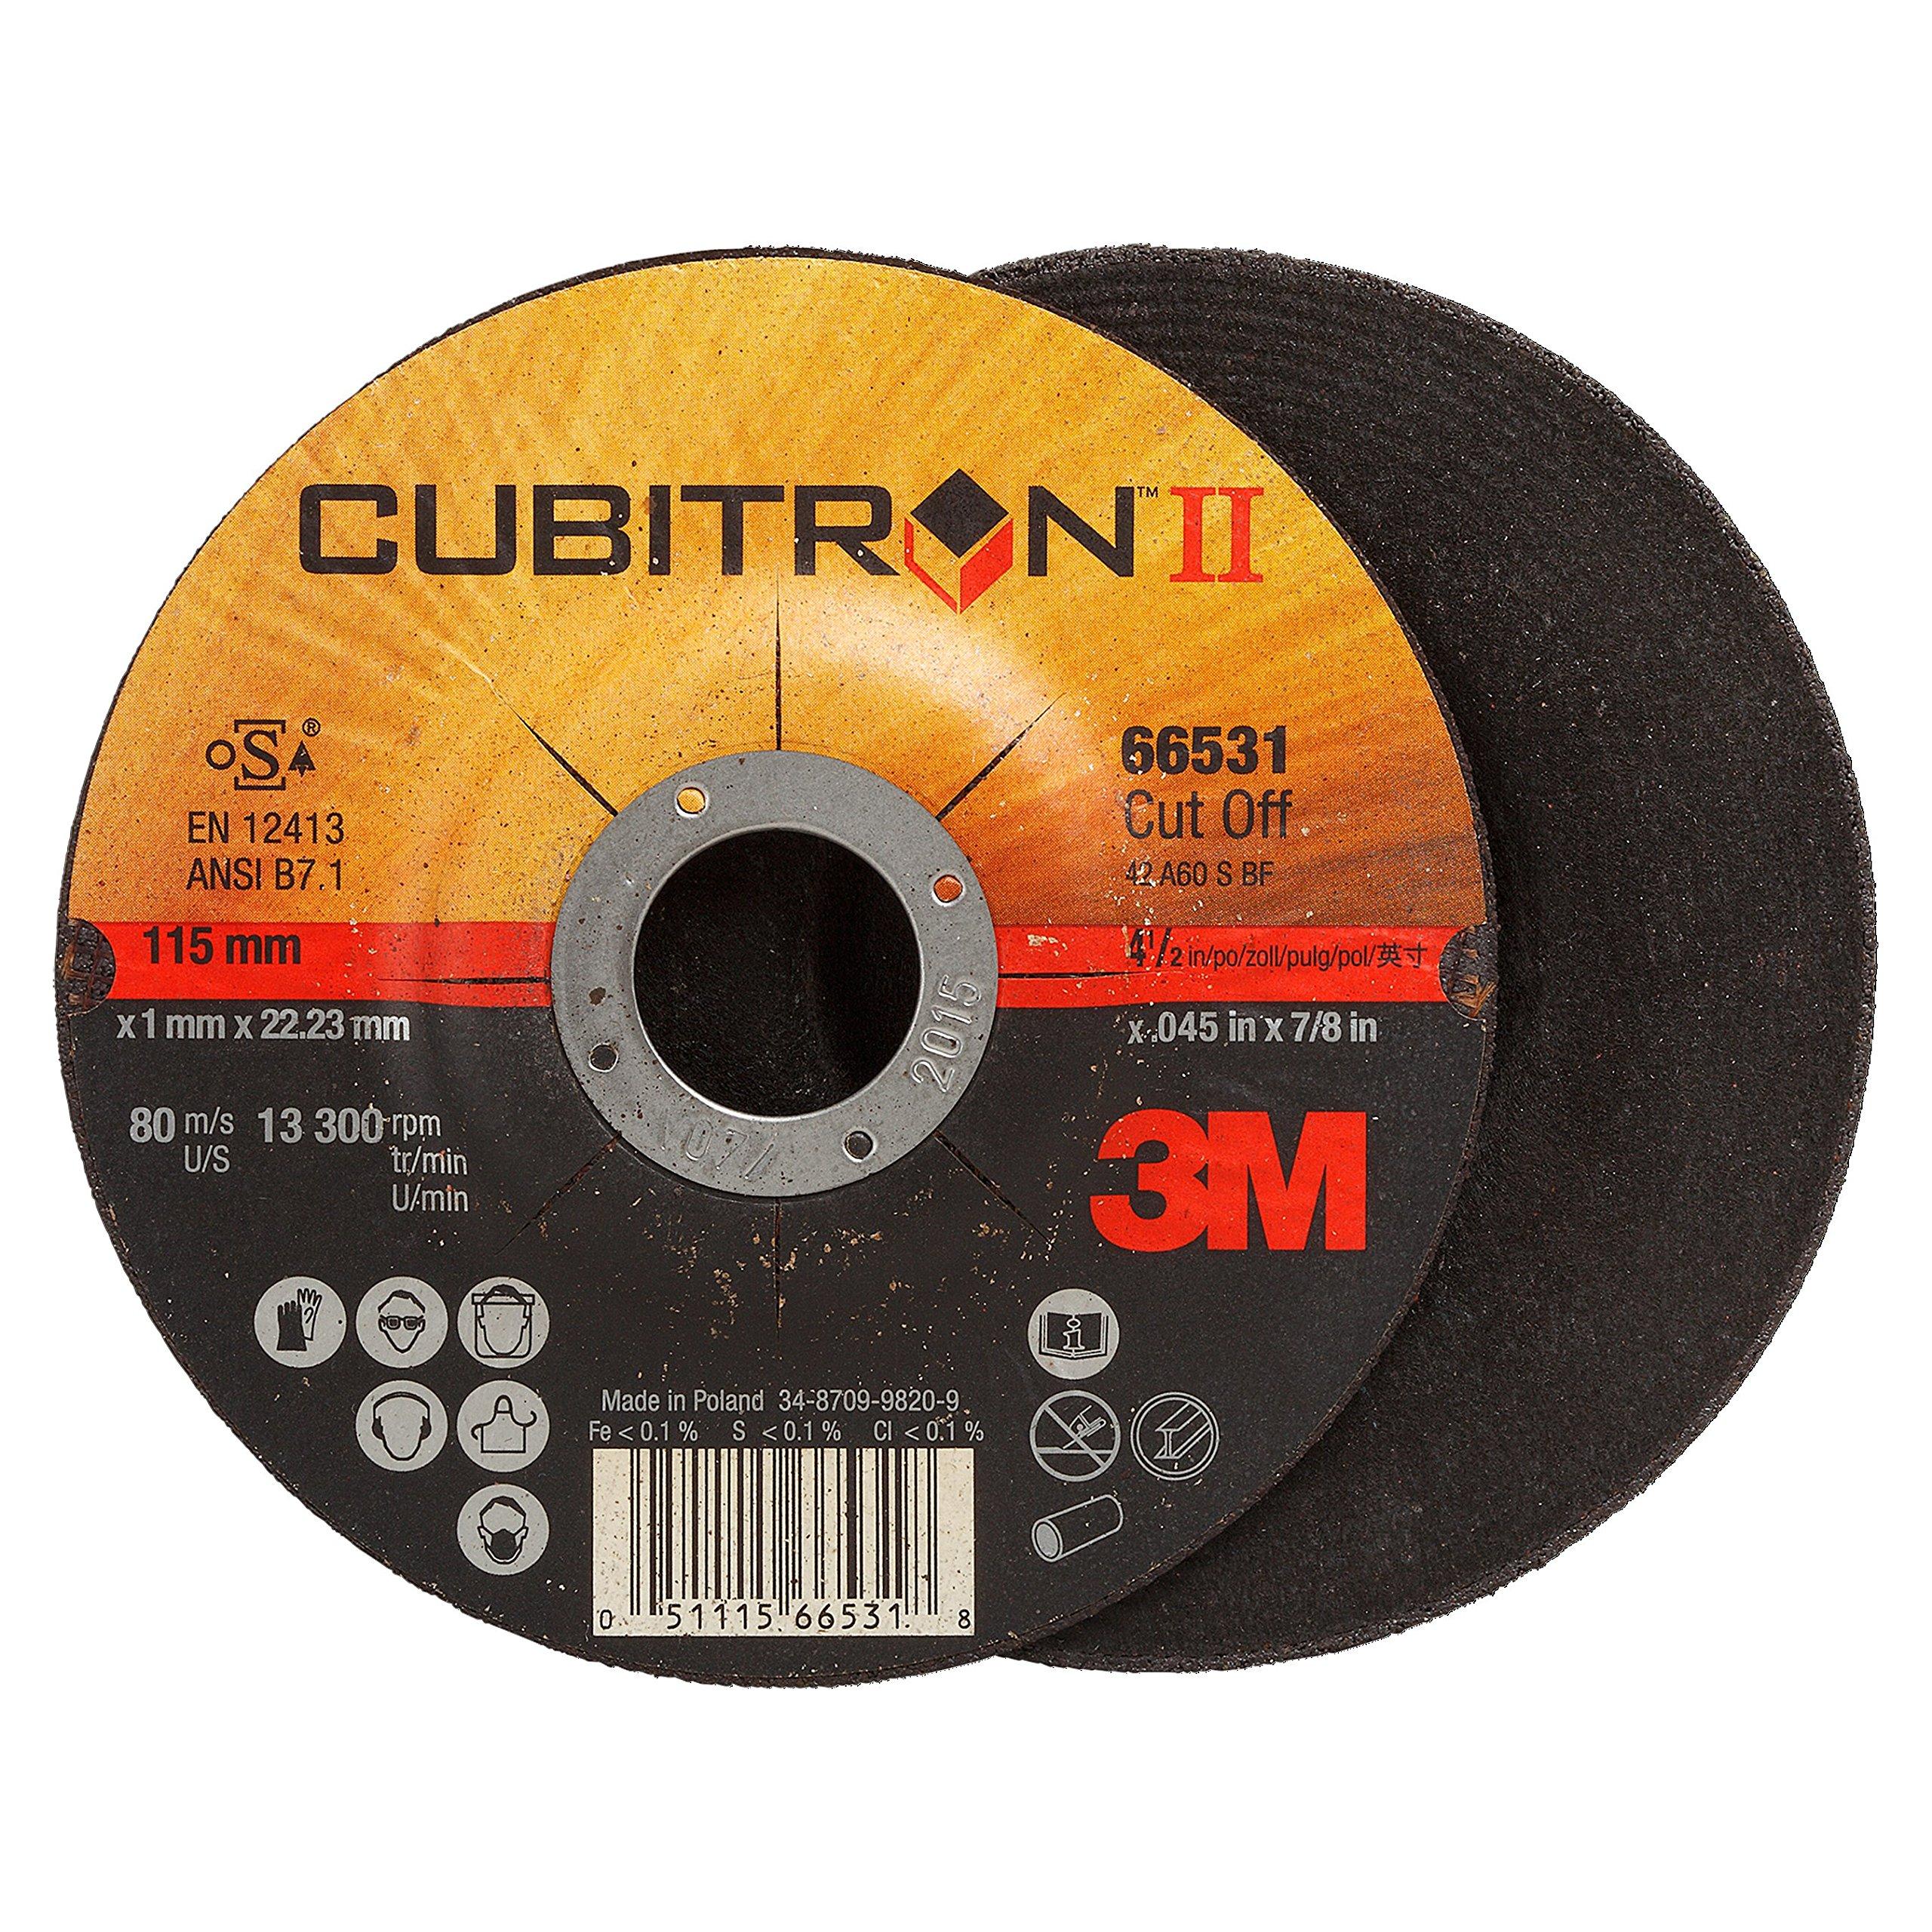 3M Cubitron II Cut-Off Wheel T27, Ceramic Grain, 4-1/2'' Diameter x 0.045'' Width, 60 Grit, 7/8'' Center Hole Diameter (Pack of 25)